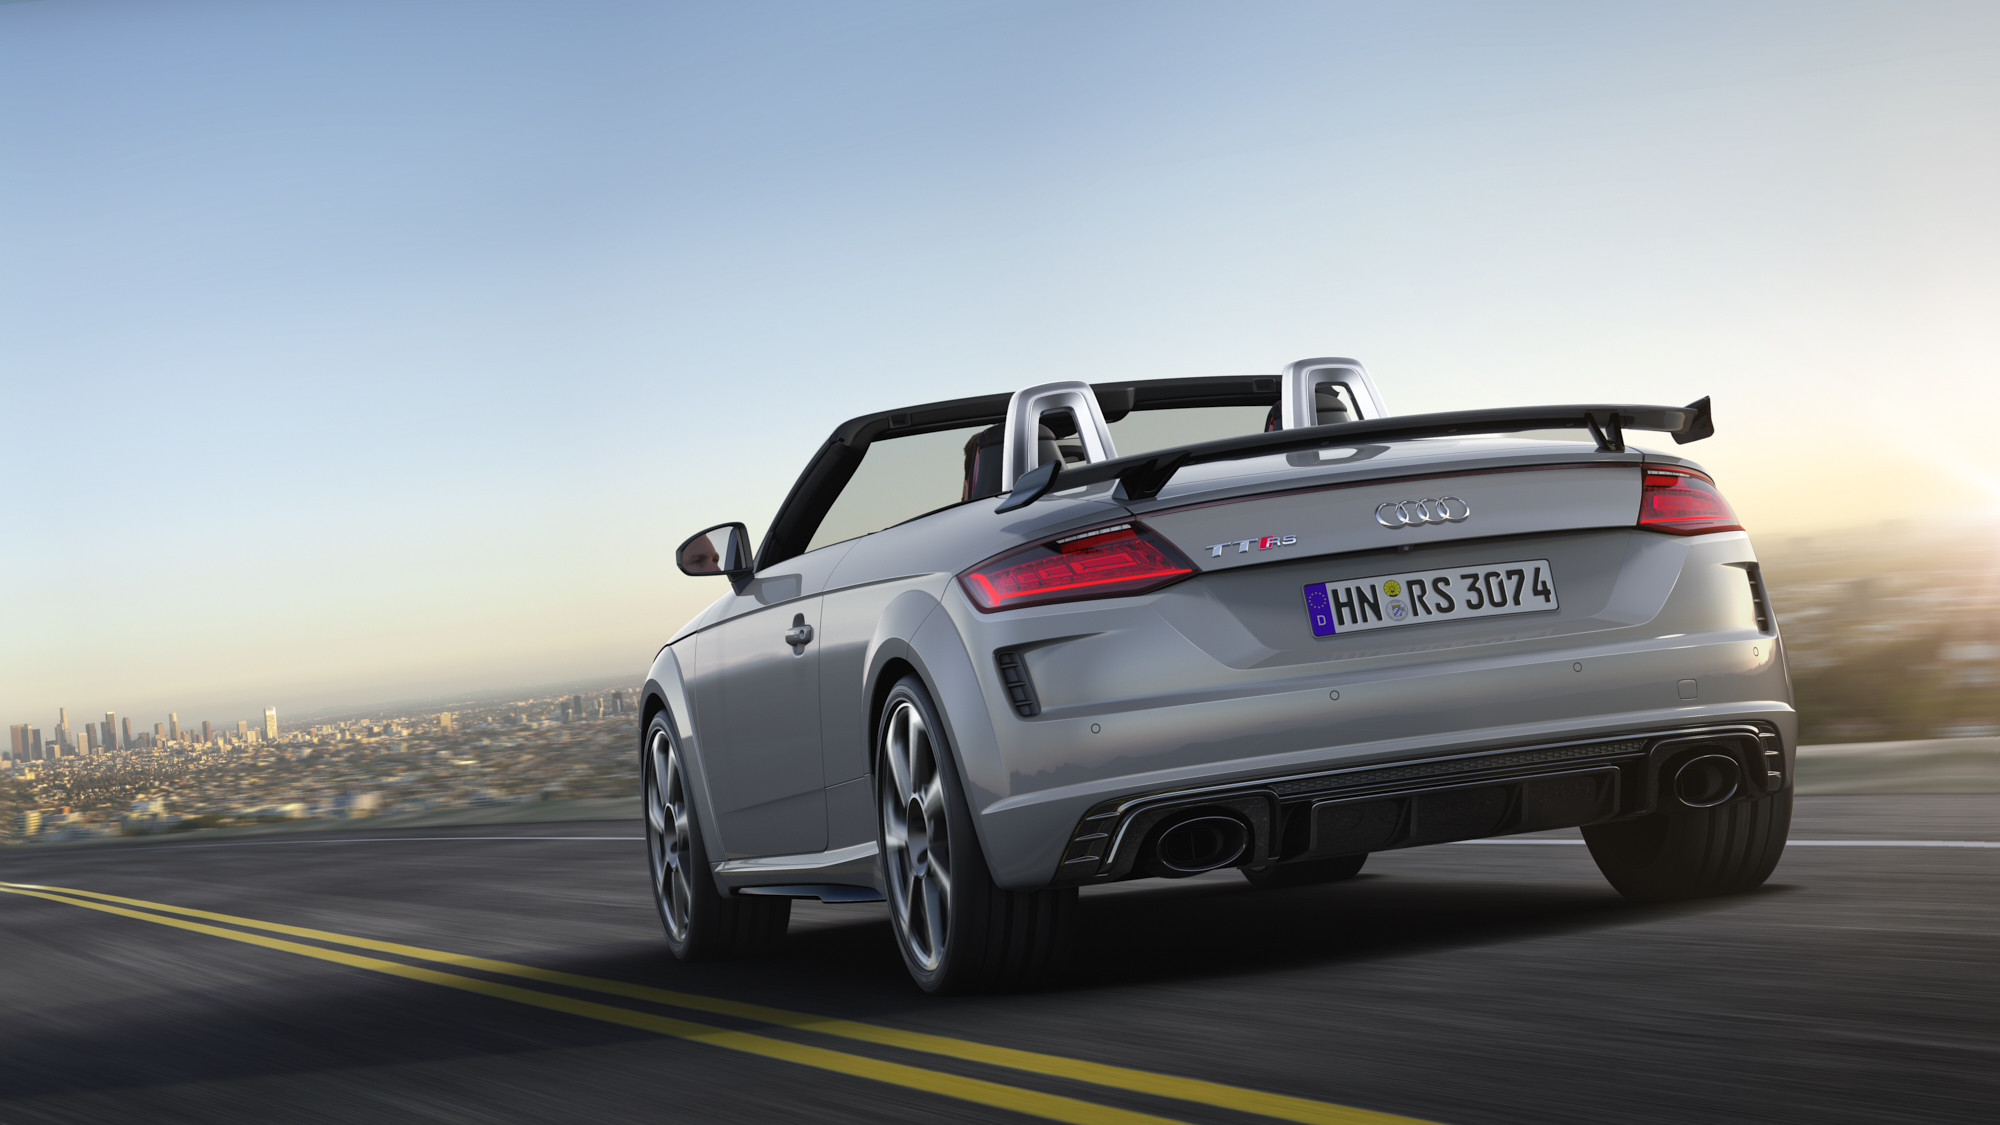 RWink_Audi_TT_RS_Roadster_Speed_004_B2200